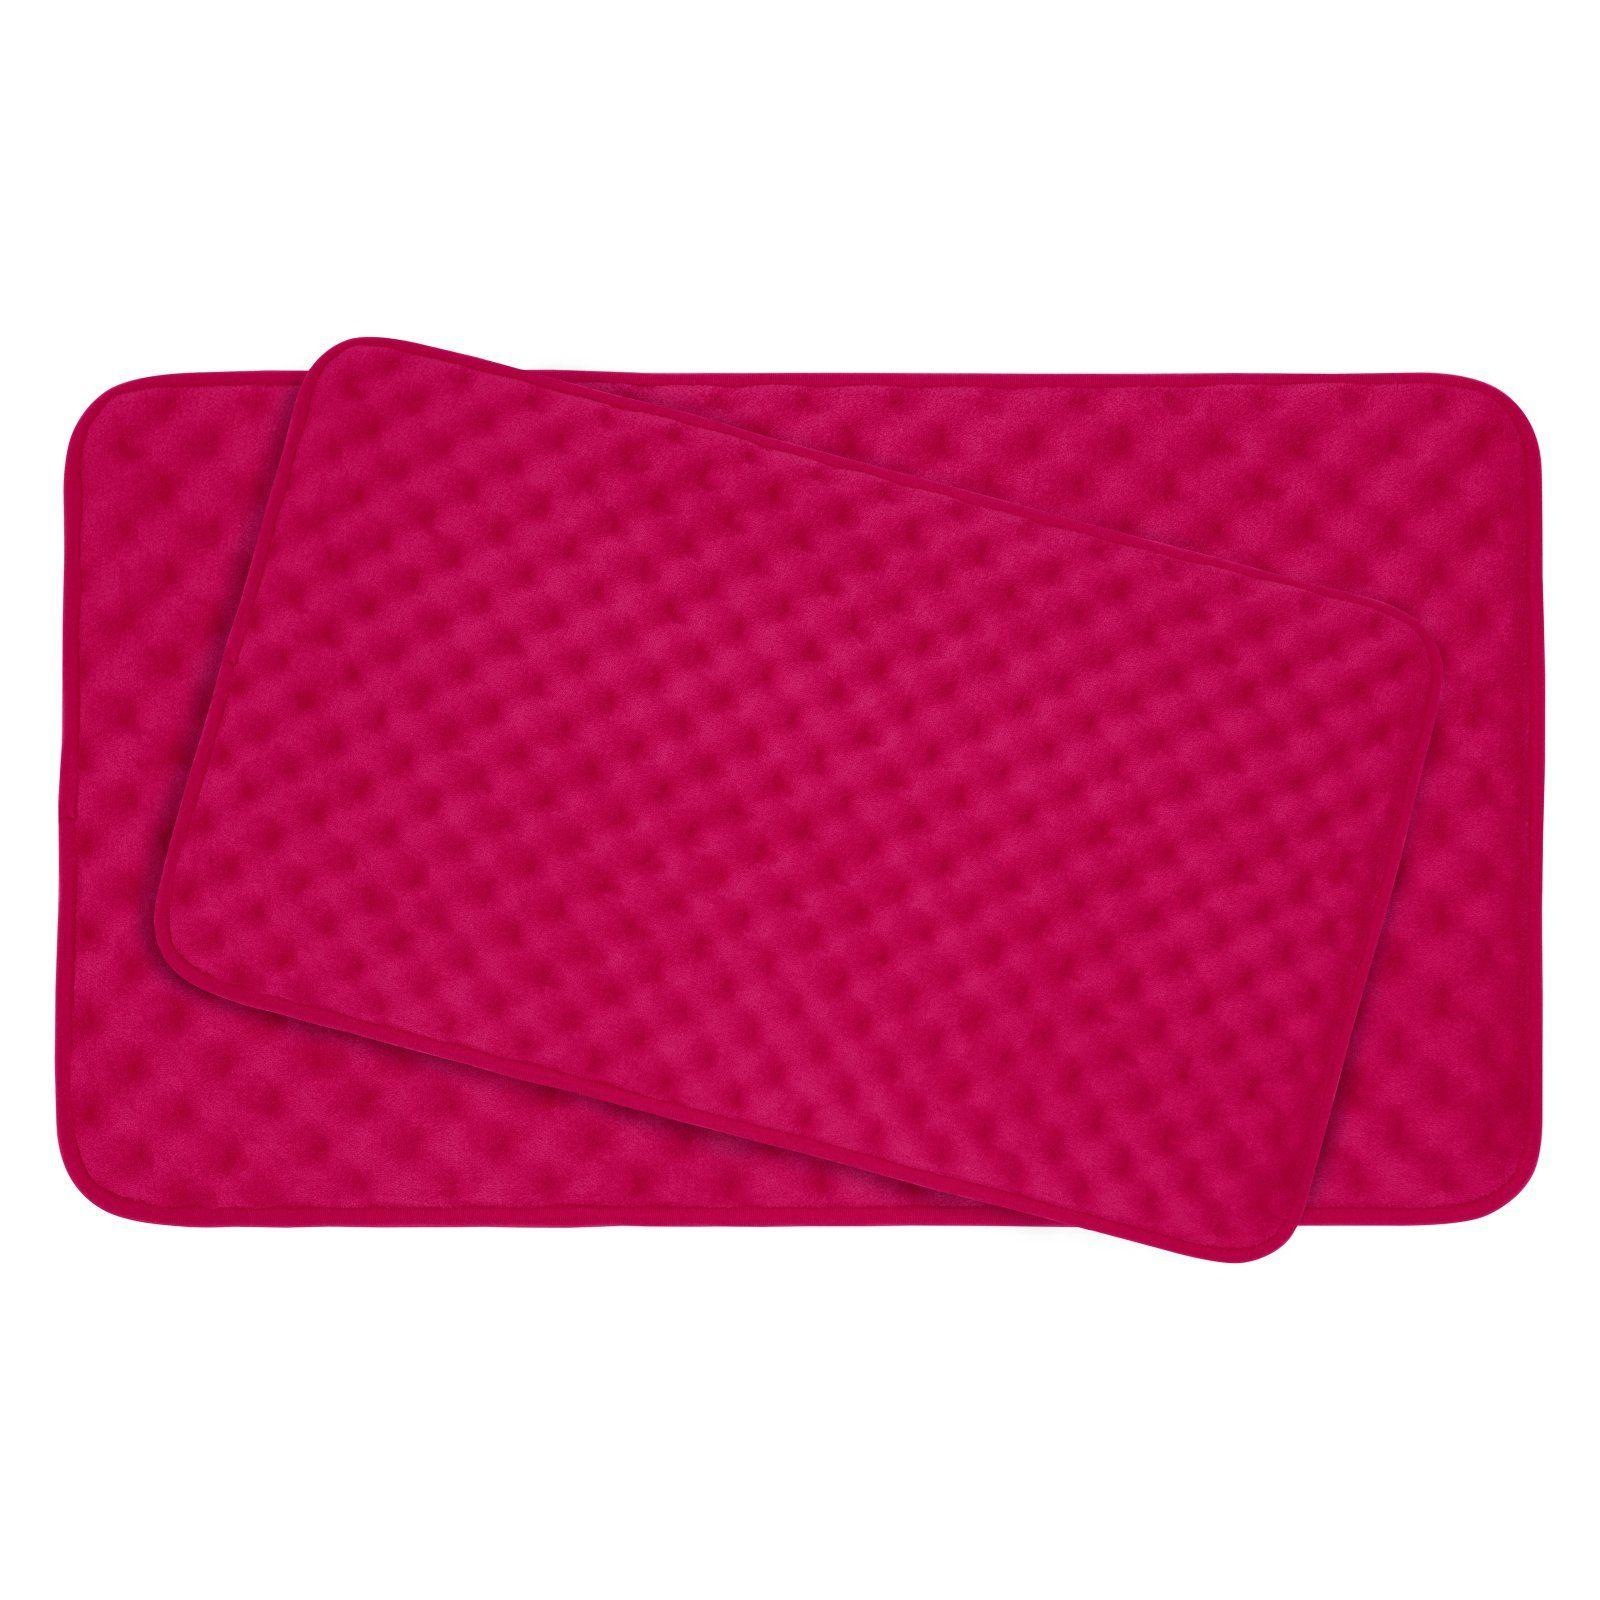 Bounce Comfort Massage Premium Extra Thick Memory Foam Bath Mat